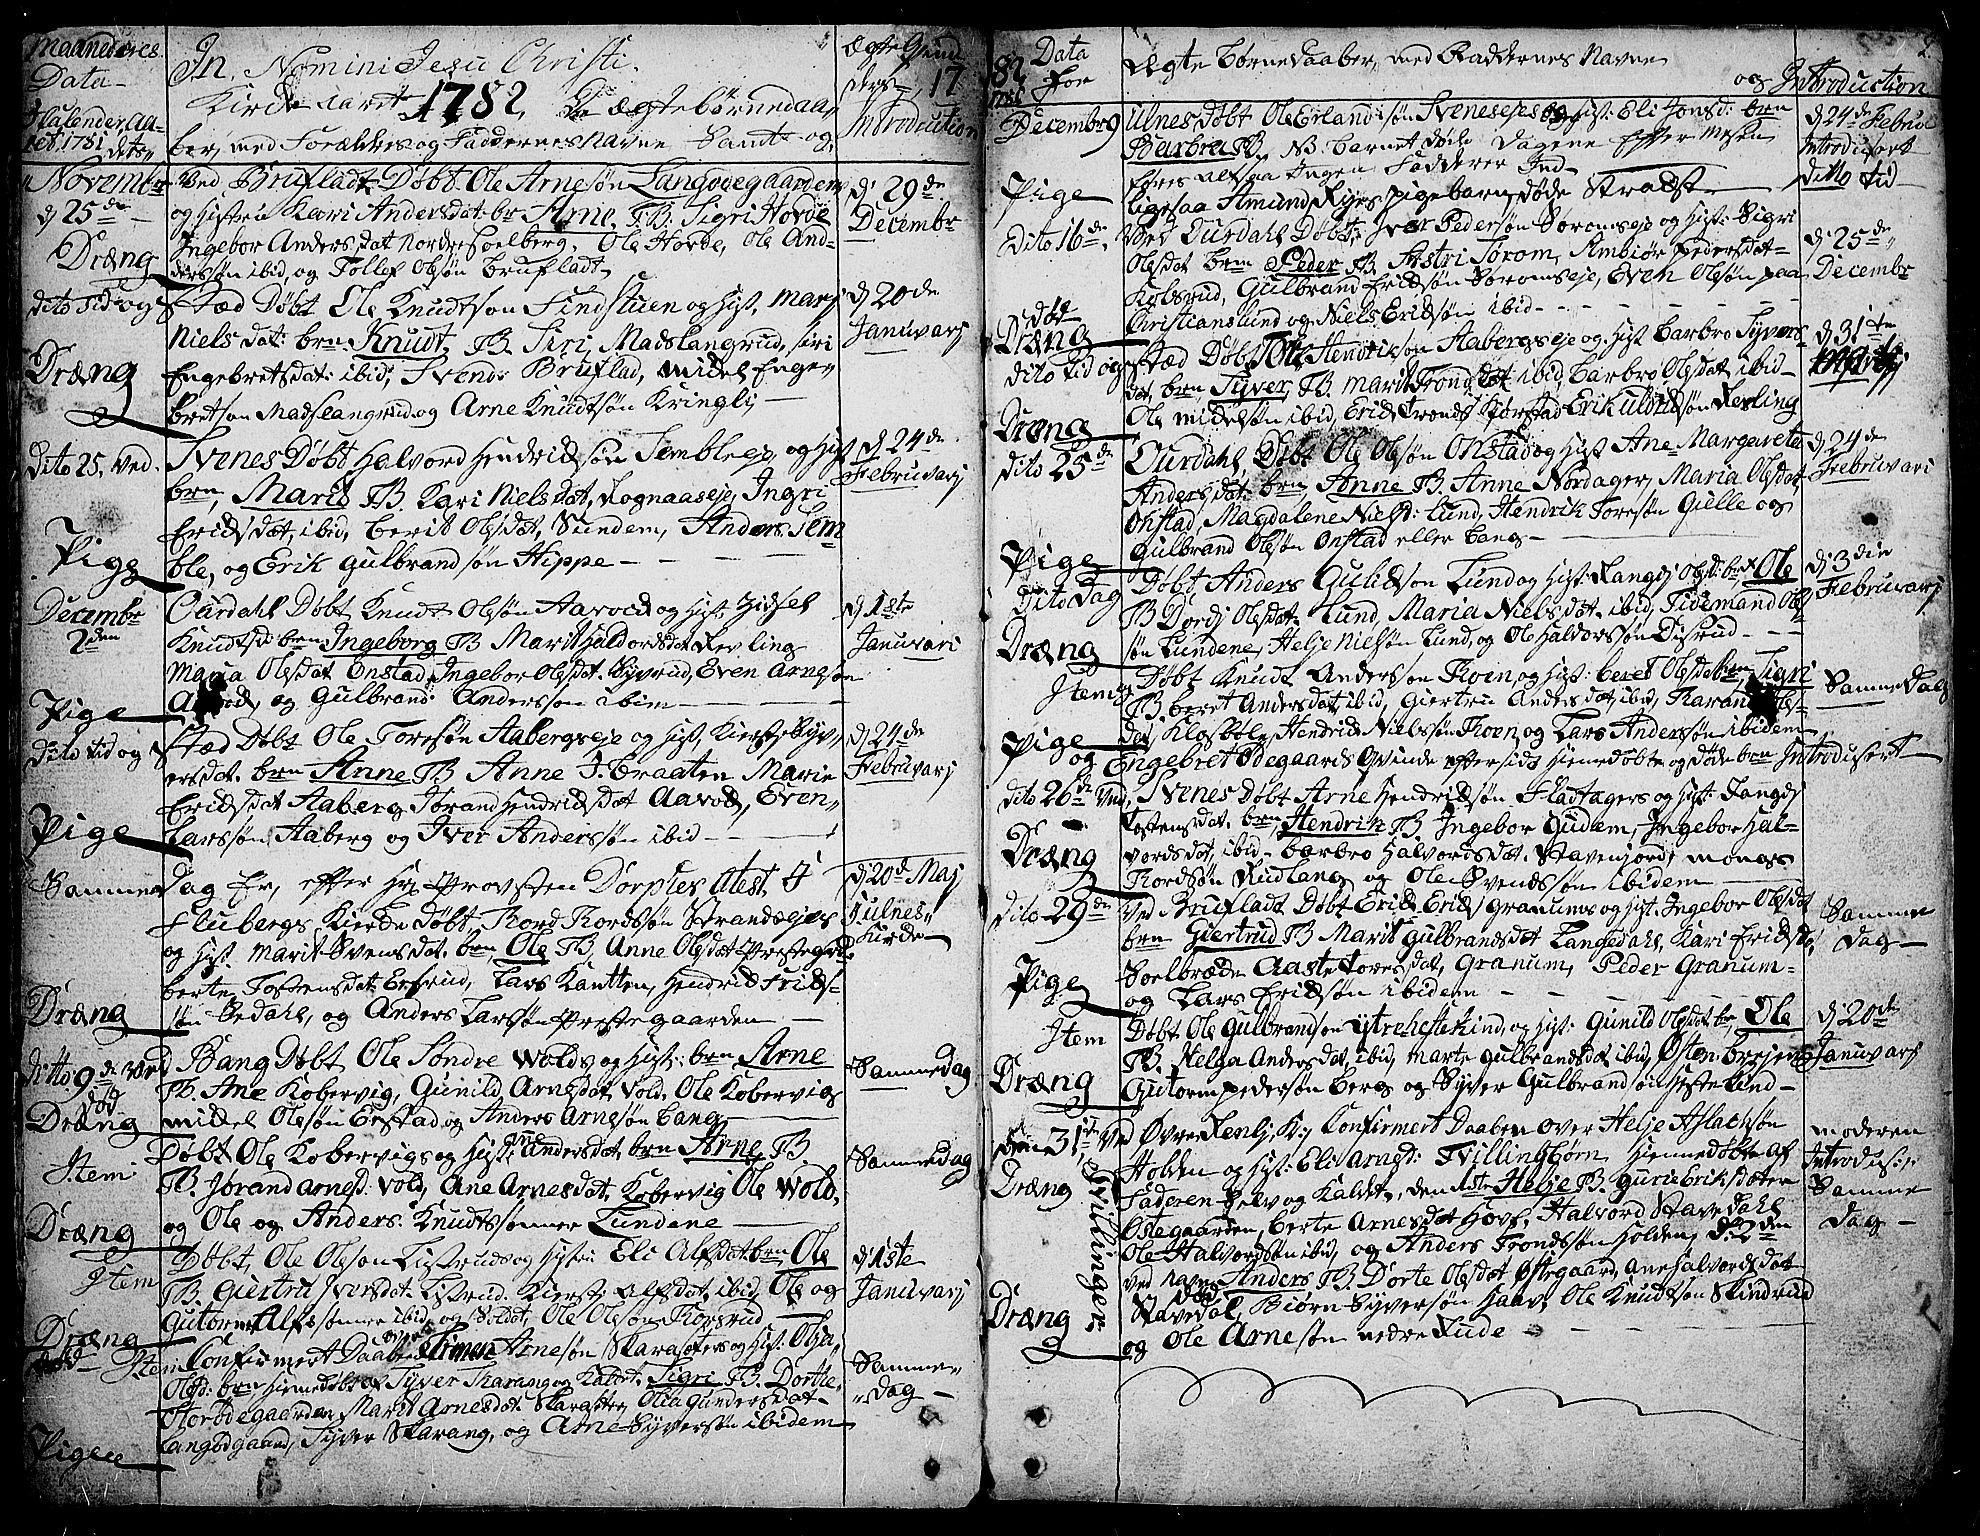 SAH, Aurdal prestekontor, Ministerialbok nr. 6, 1781-1804, s. 2